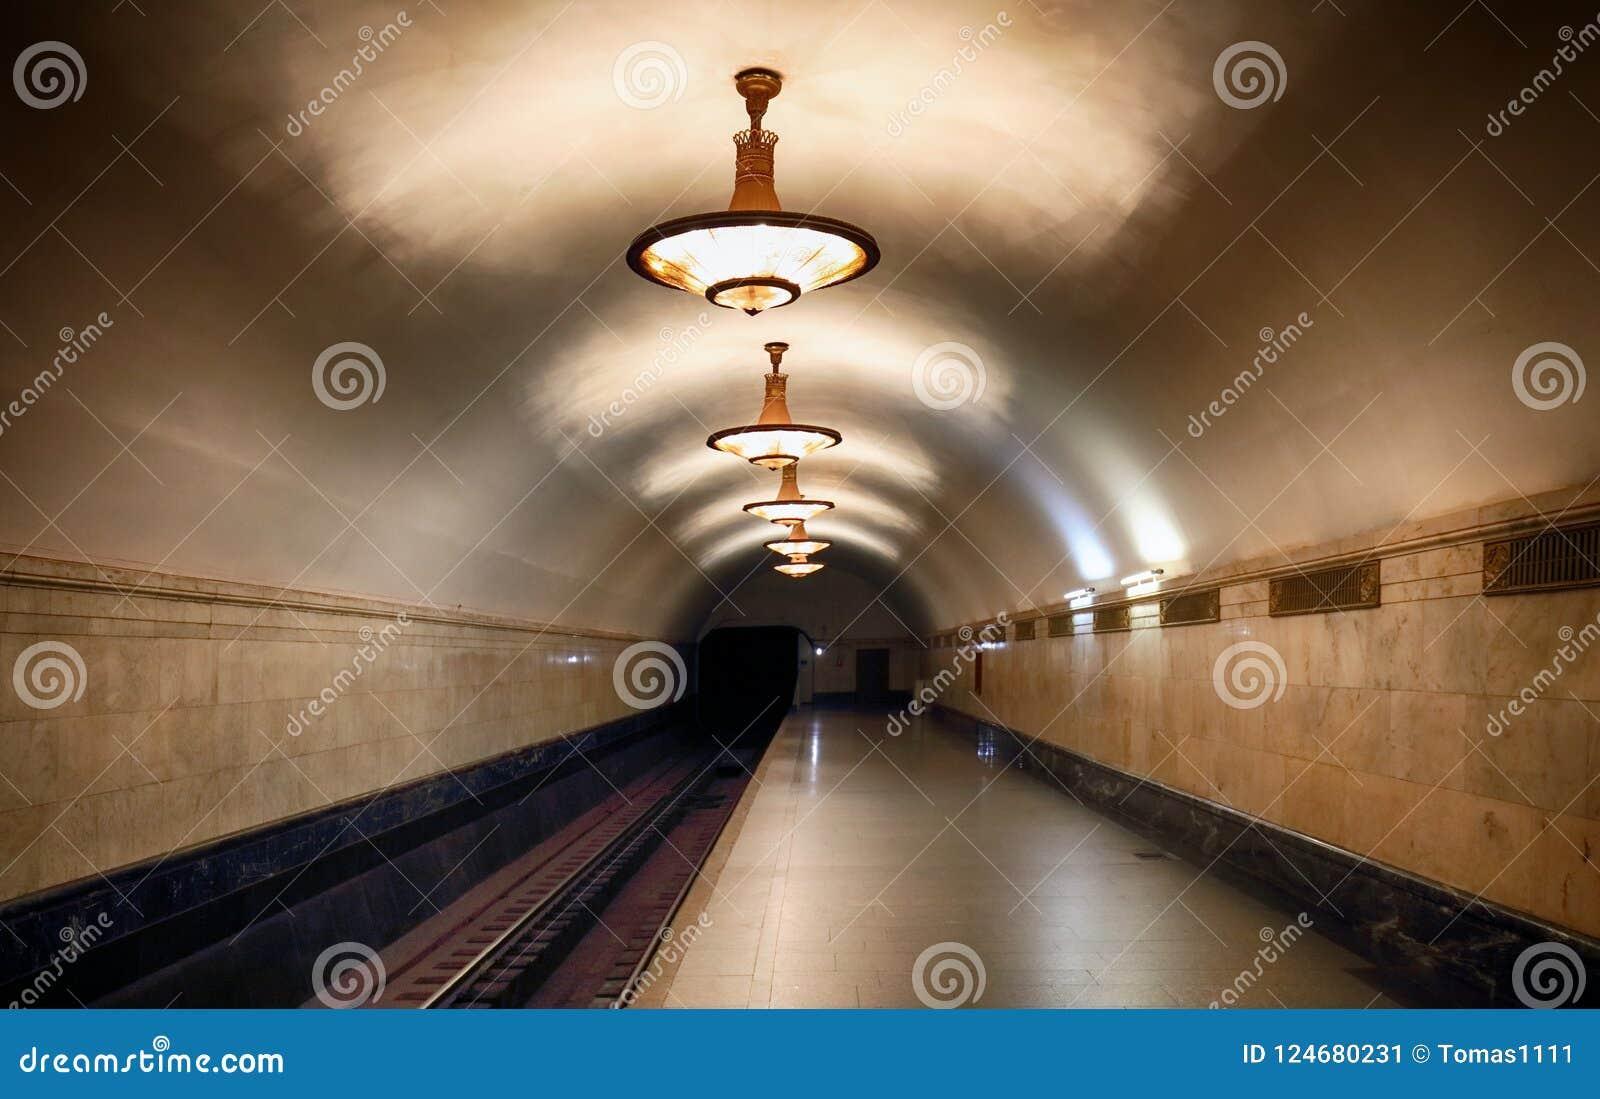 MOSKVA RYSSLAND - AUGUSTI 4, 2018: Tunnelbanastation Novoslobodskaya Nolla